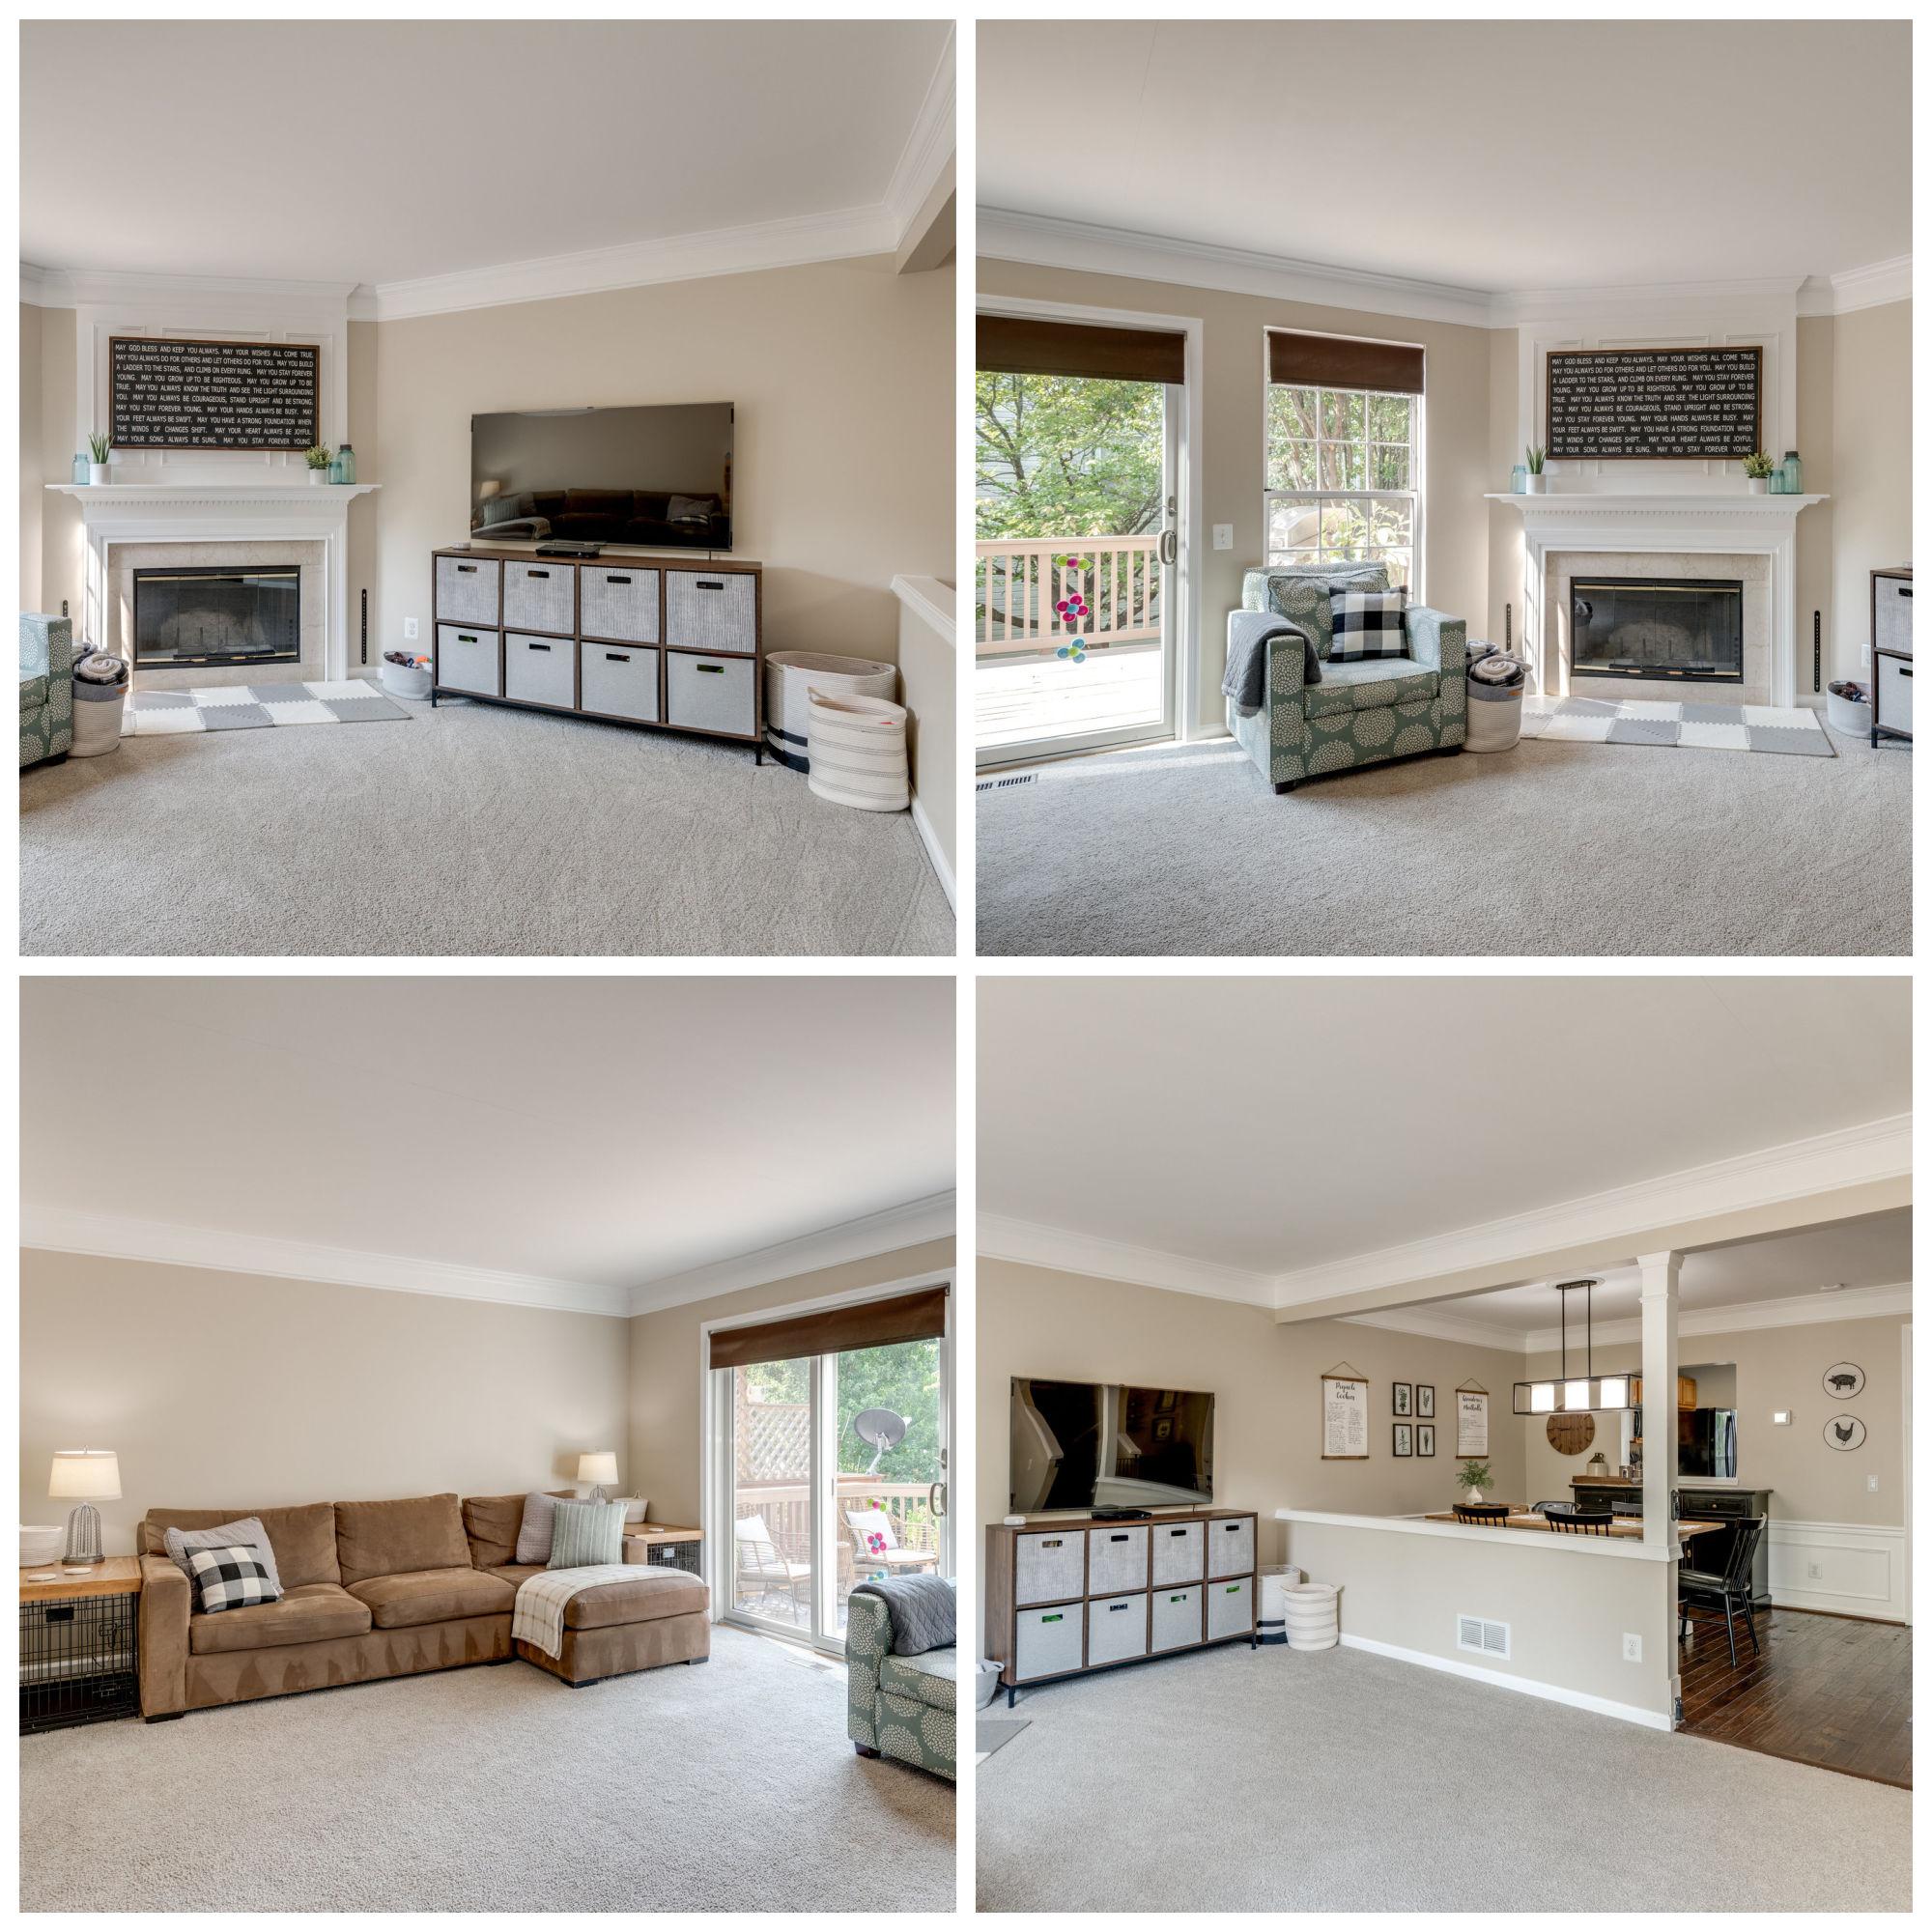 334 Millbrook Ter NE, Leesburg- Living Room